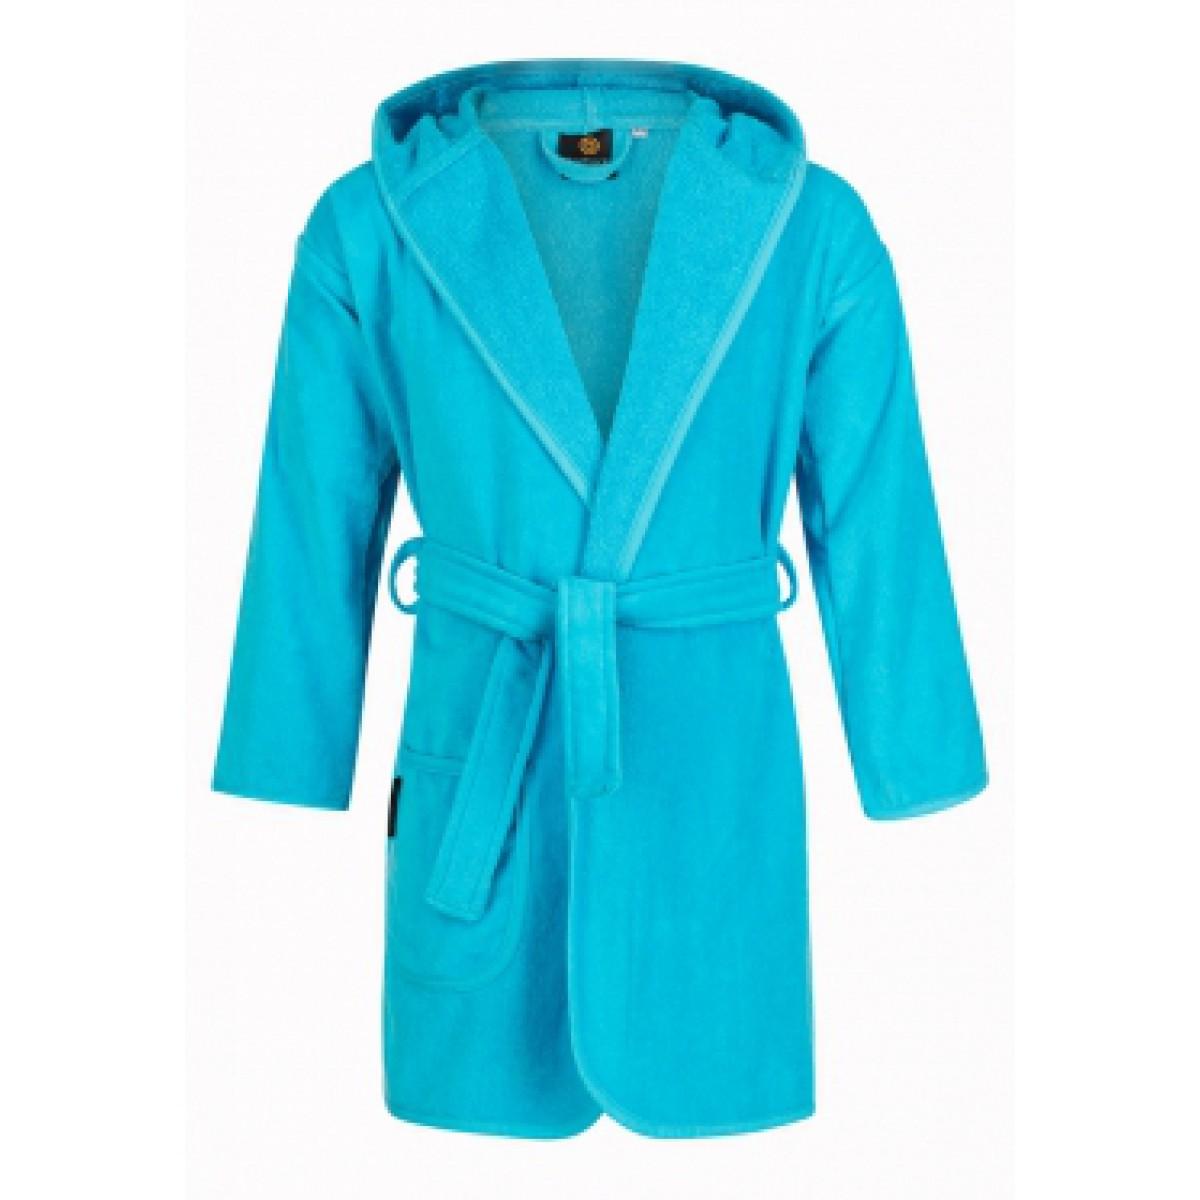 Kinderbadjas aquablauw